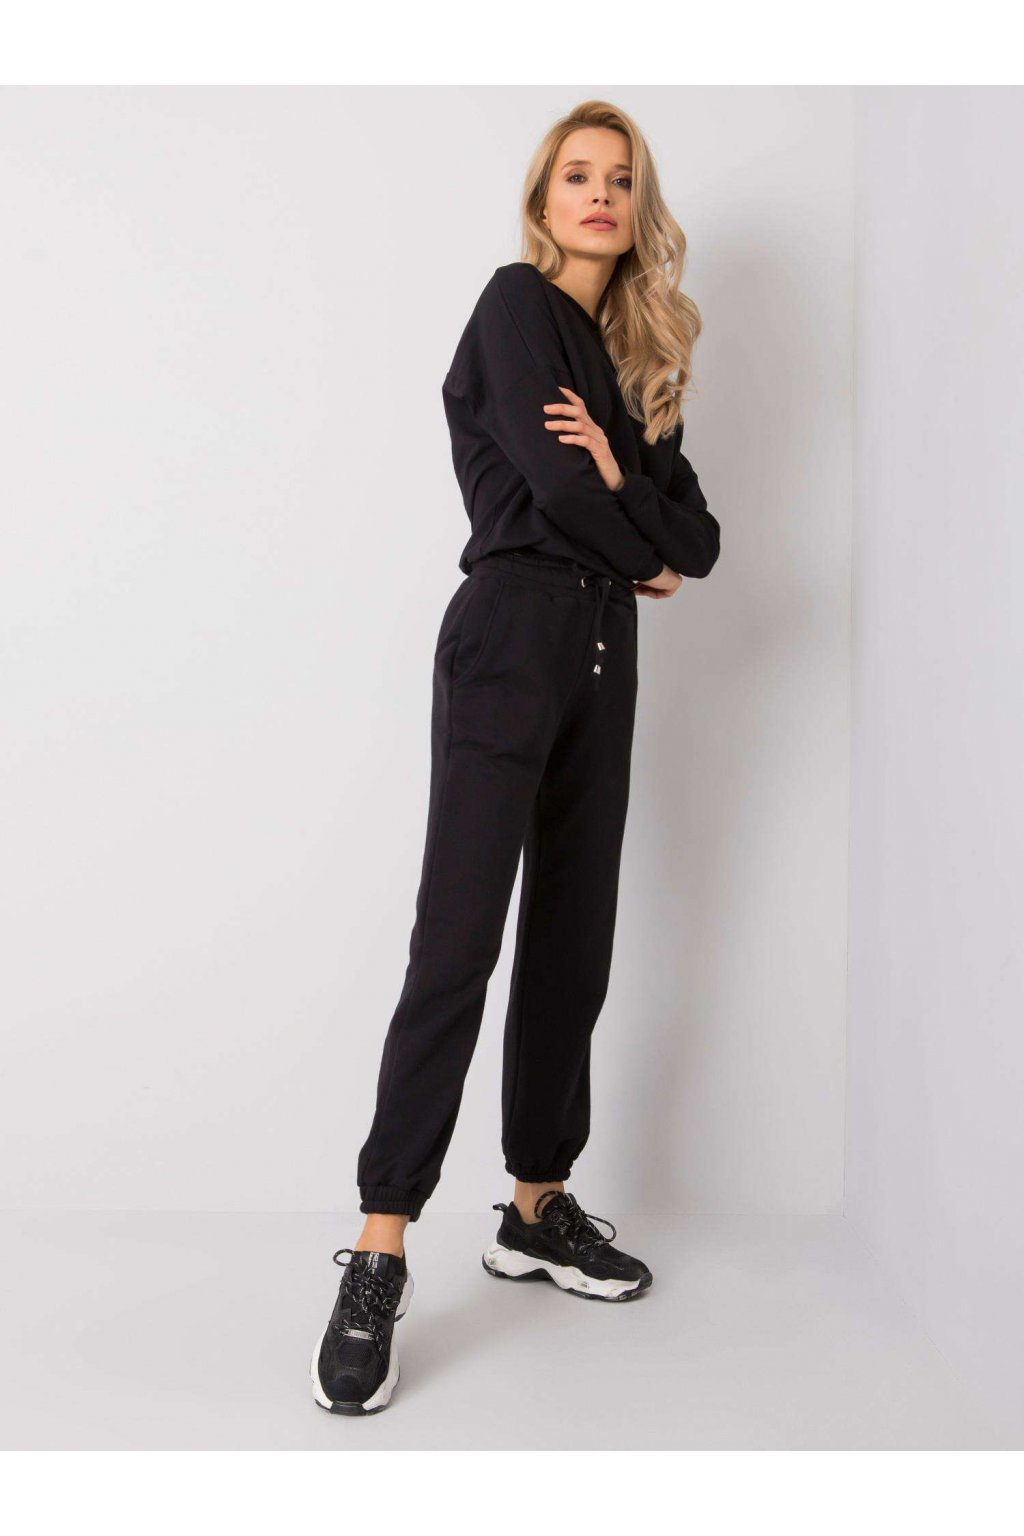 pol pl Czarne spodnie Agueda RUE PARIS 359530 1